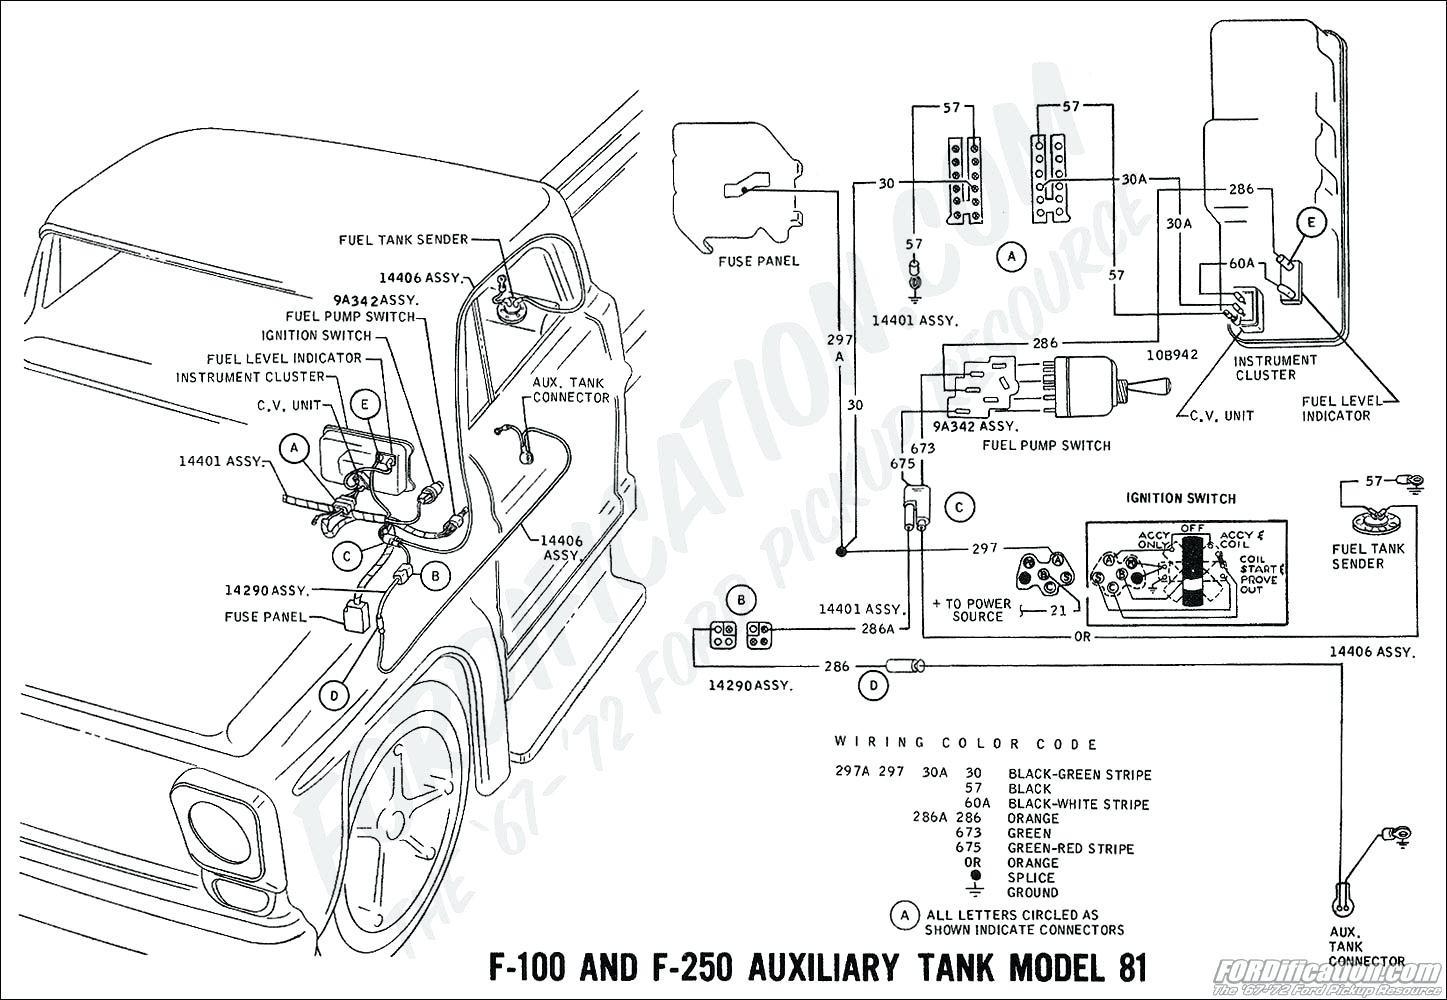 hight resolution of 2000 f450 fuel gauge wiring diagram wiring diagram for light switch u2022 ford fuel gauge